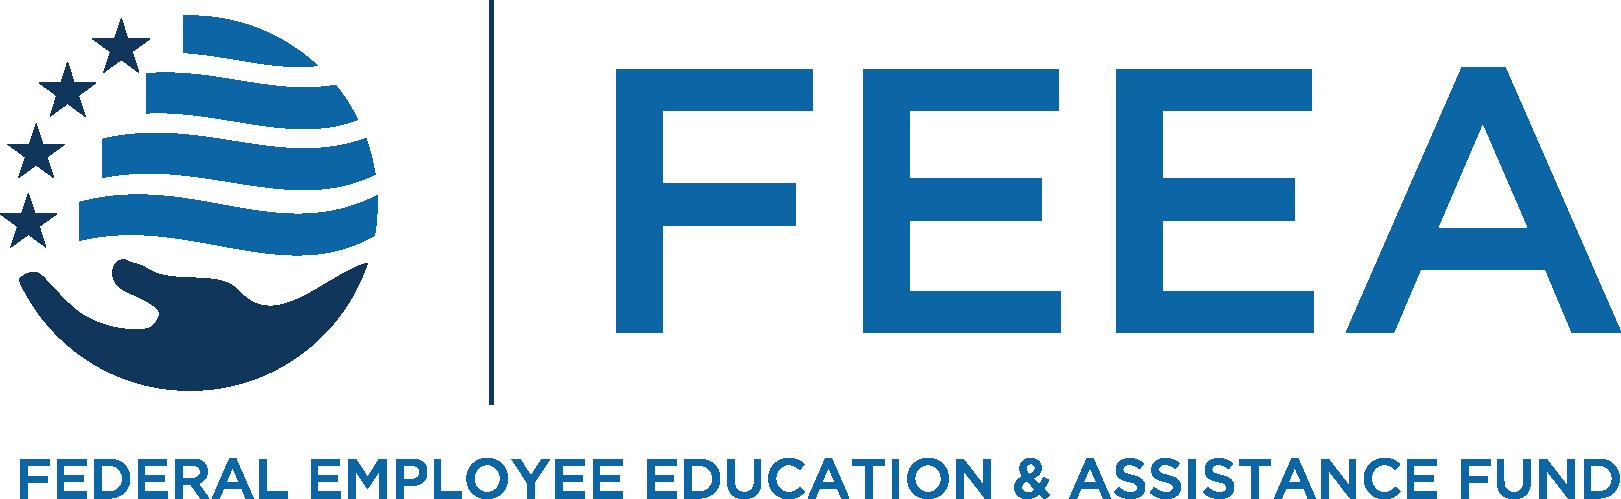 Federal Employee Education & Assistance Fund (FEEA)